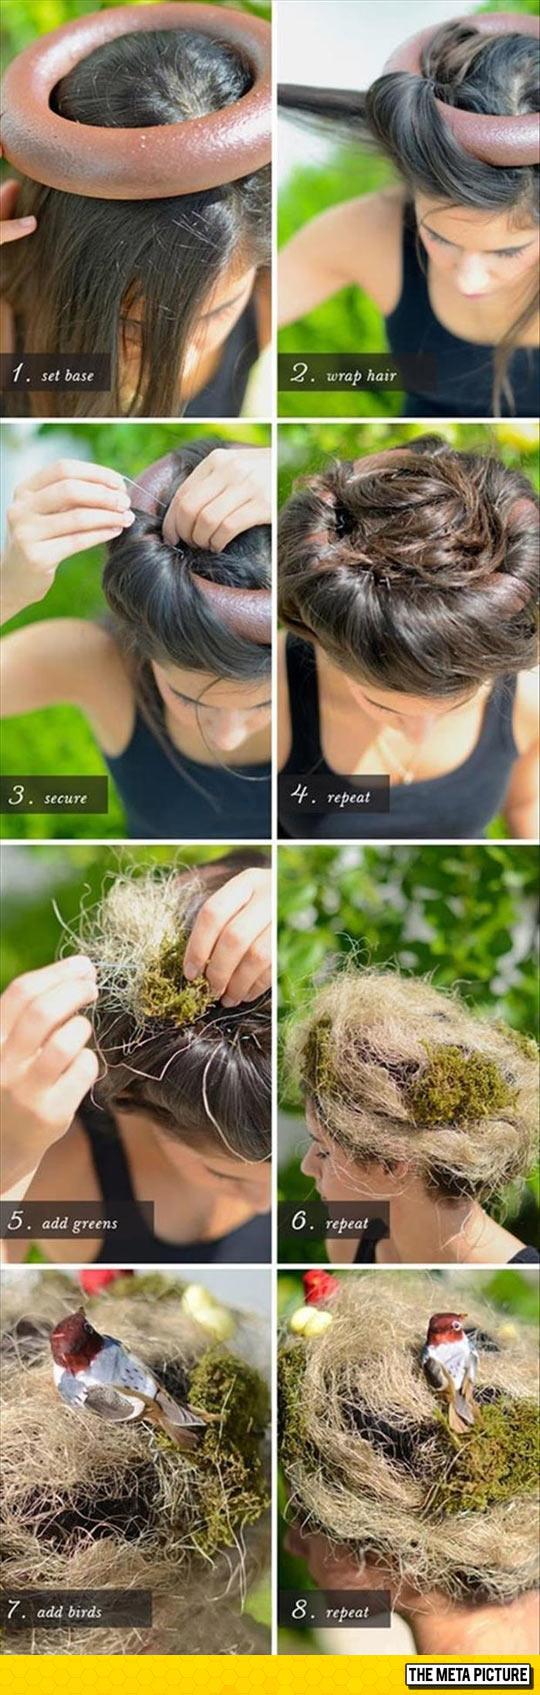 funny-hairstyle-nest-bird-grass